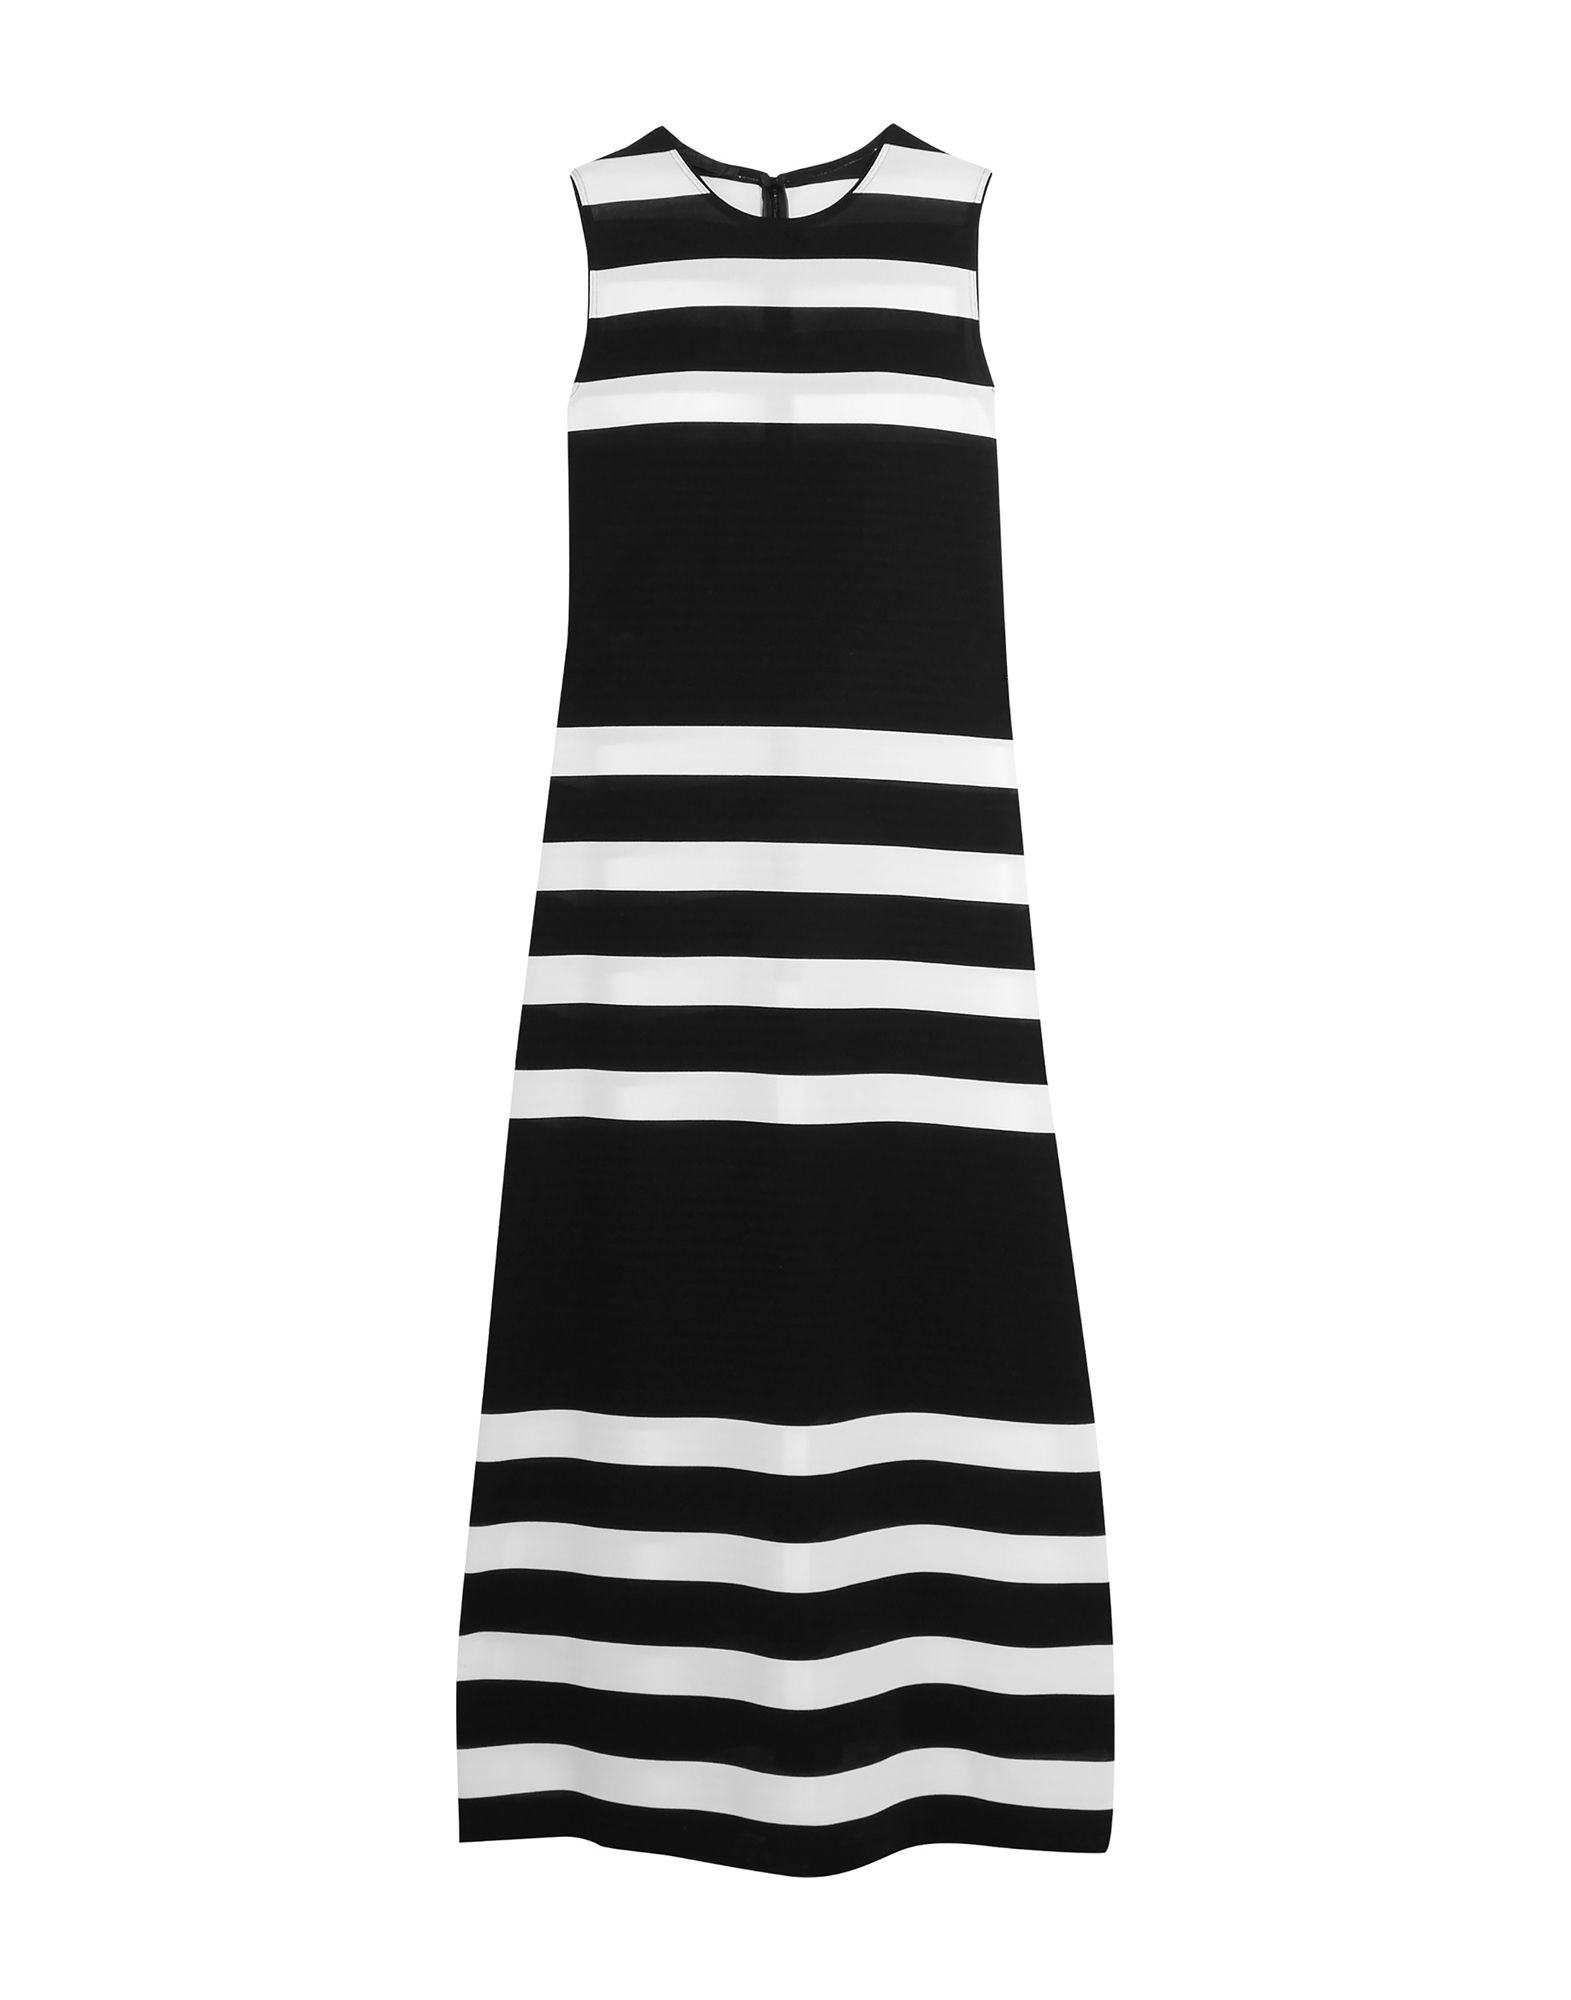 Фото - CALVIN KLEIN COLLECTION Платье длиной 3/4 calvin klein collection юбка длиной 3 4